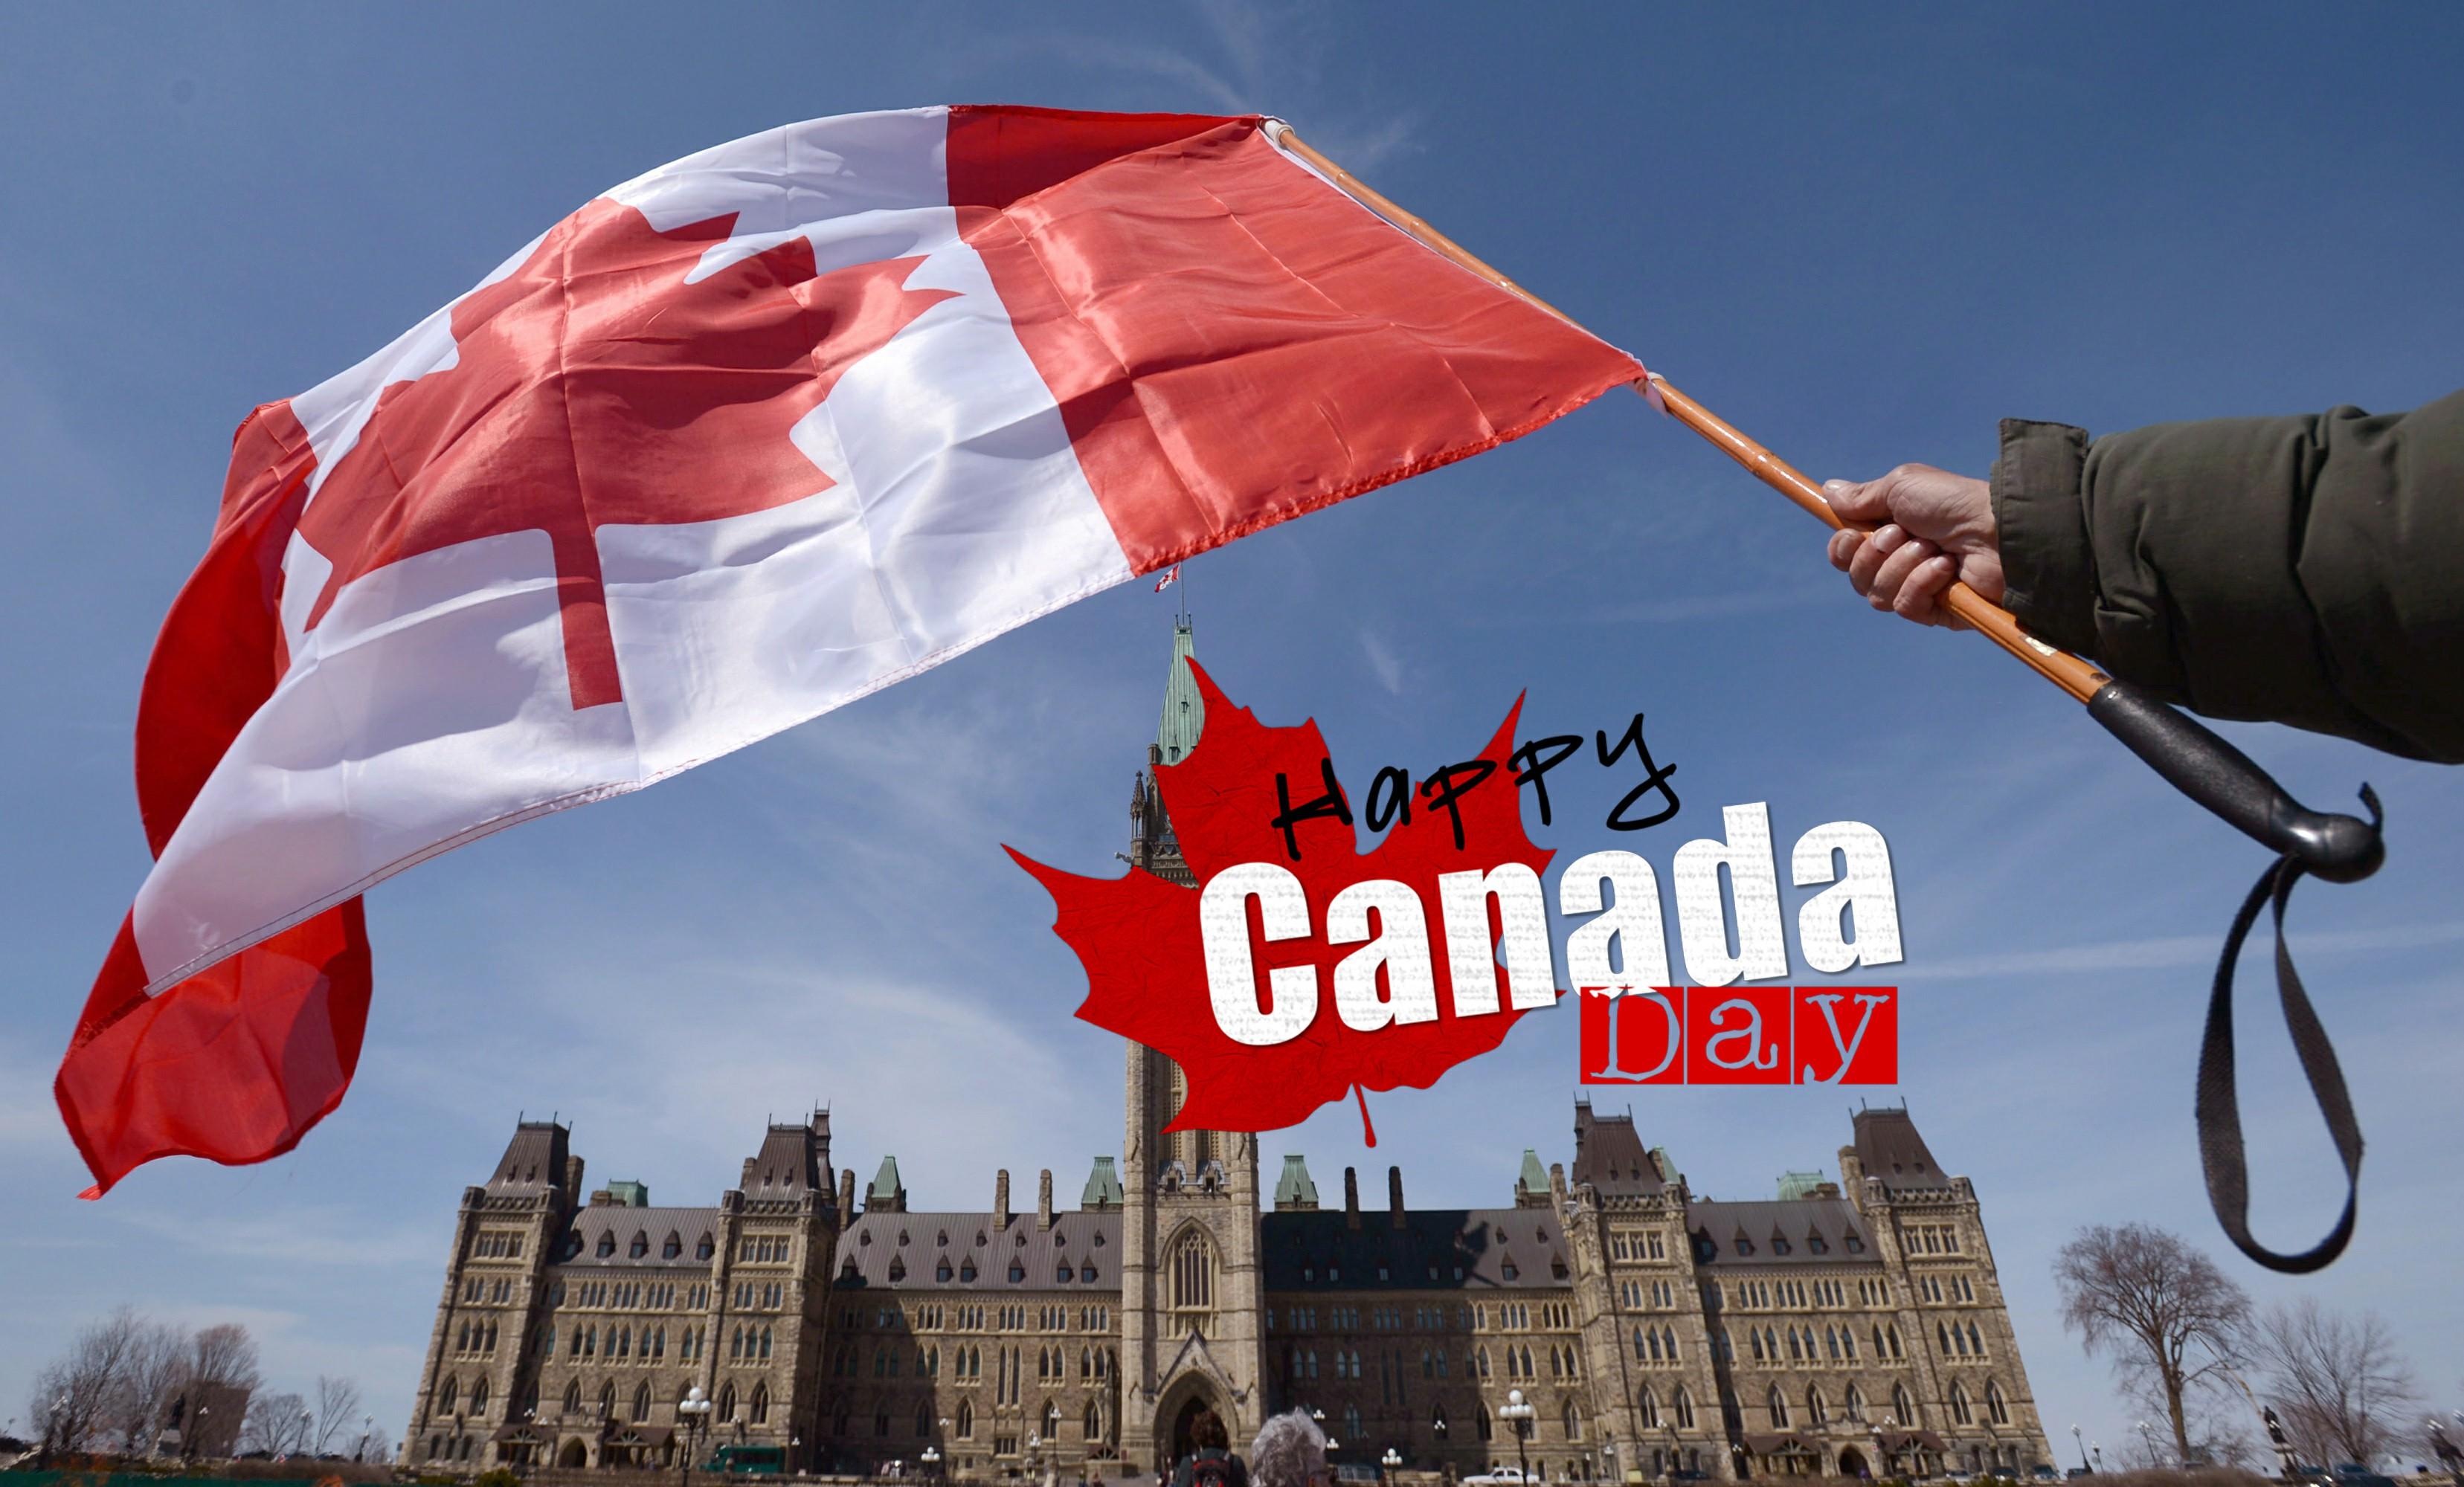 Wallpapers Inspirational Quotes Desktop Canada Day Wallpaper Hd Collection Pixelstalk Net